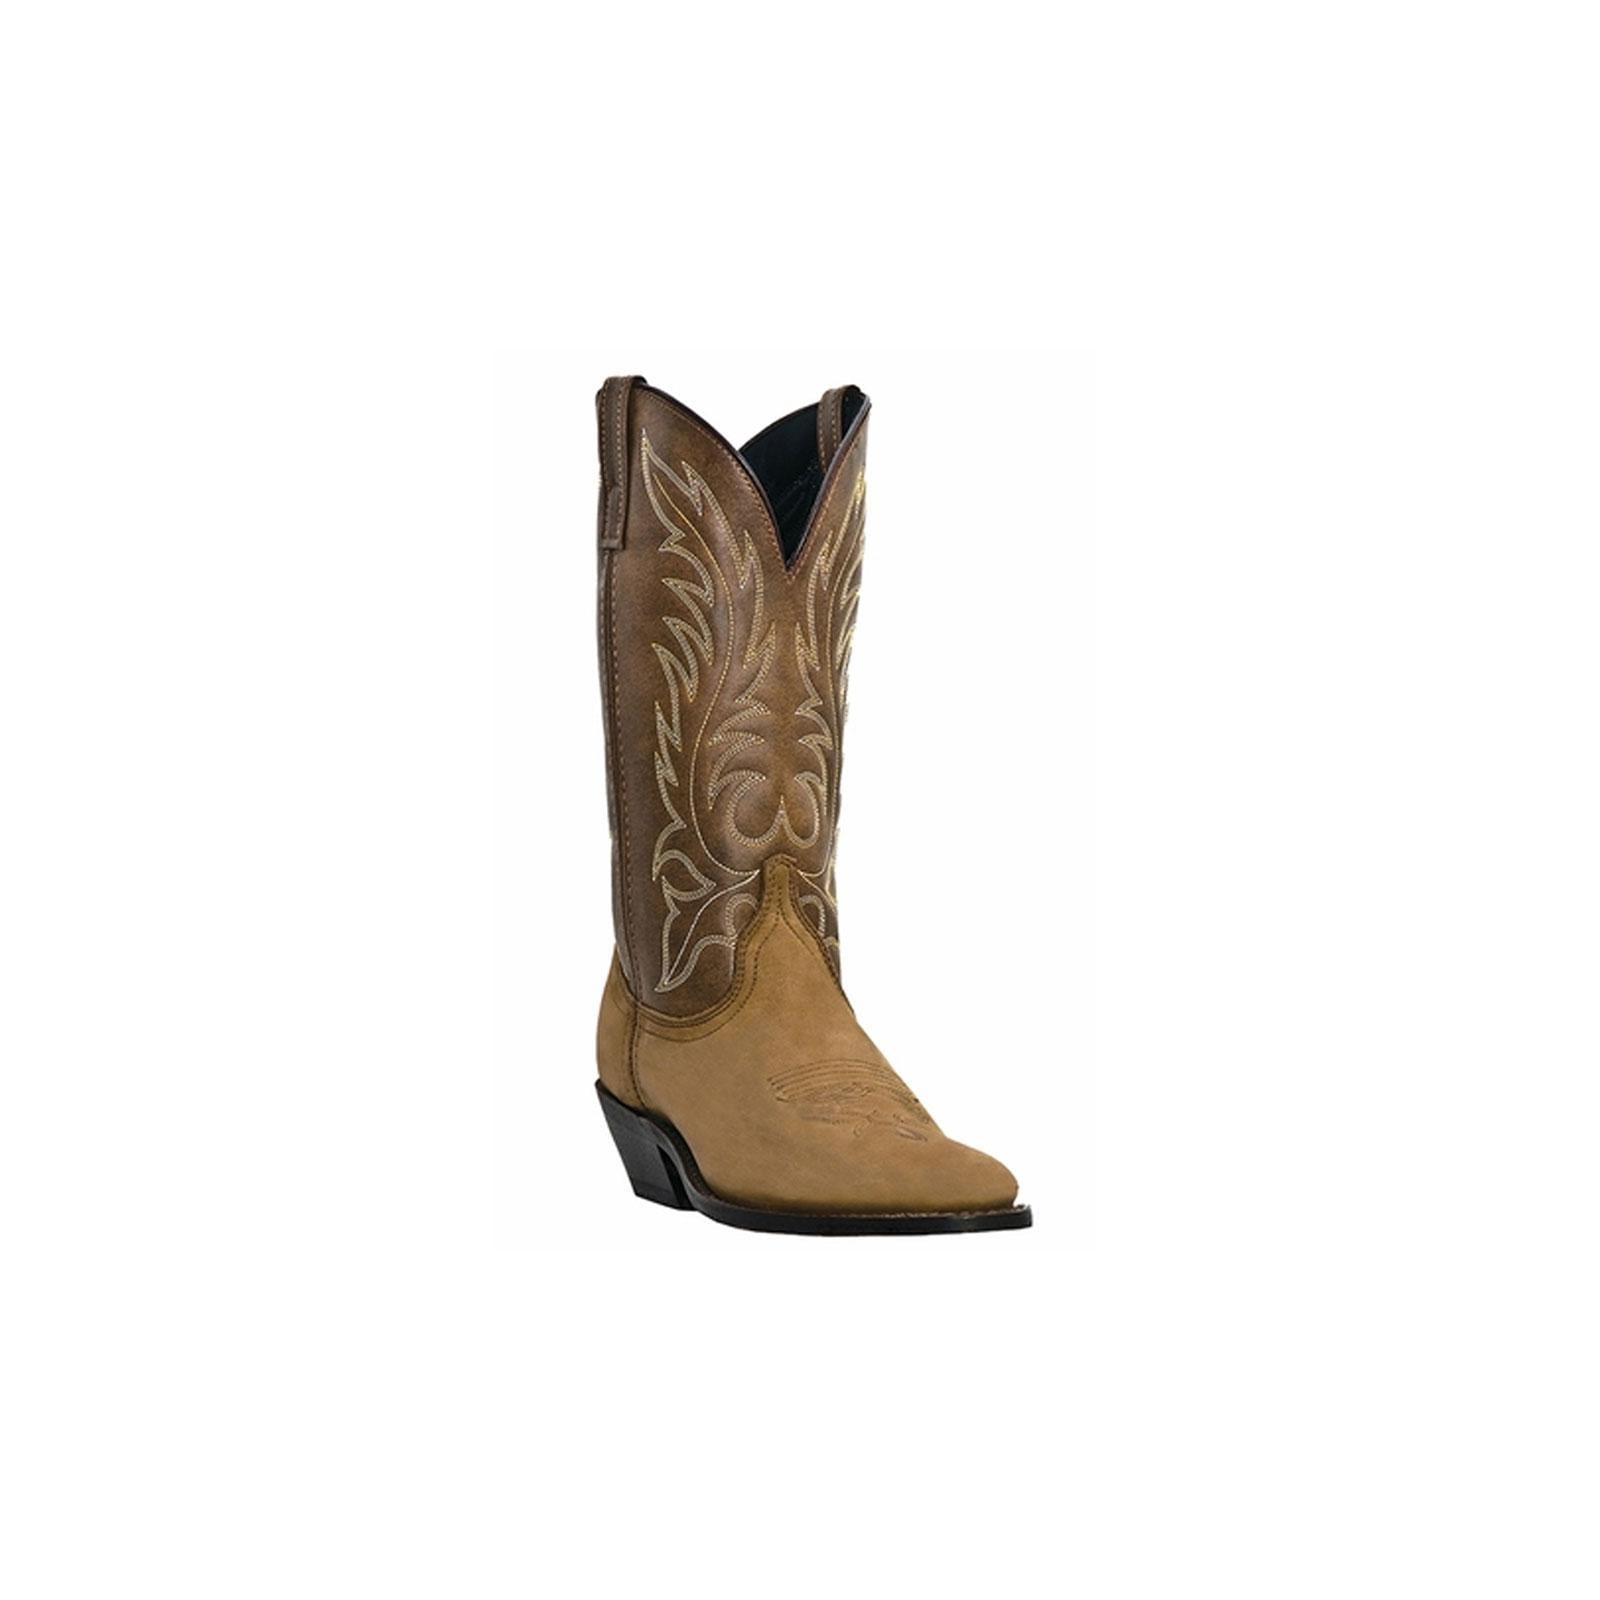 Laredo Western Boots Womens Leather Kadi Cowboy Distressed Tan 5742 by Laredo